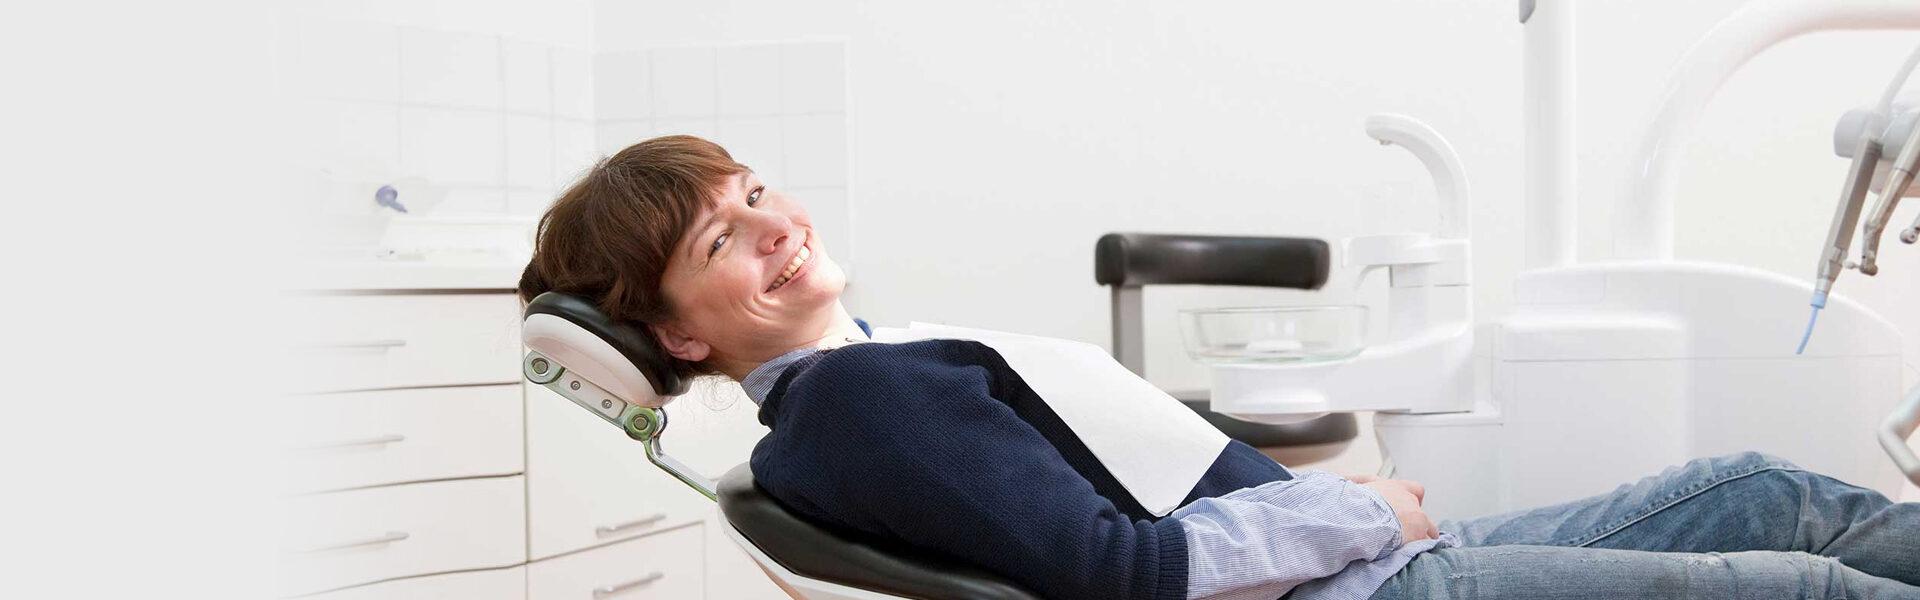 All on 4 Dental Implants® in Union, NJ